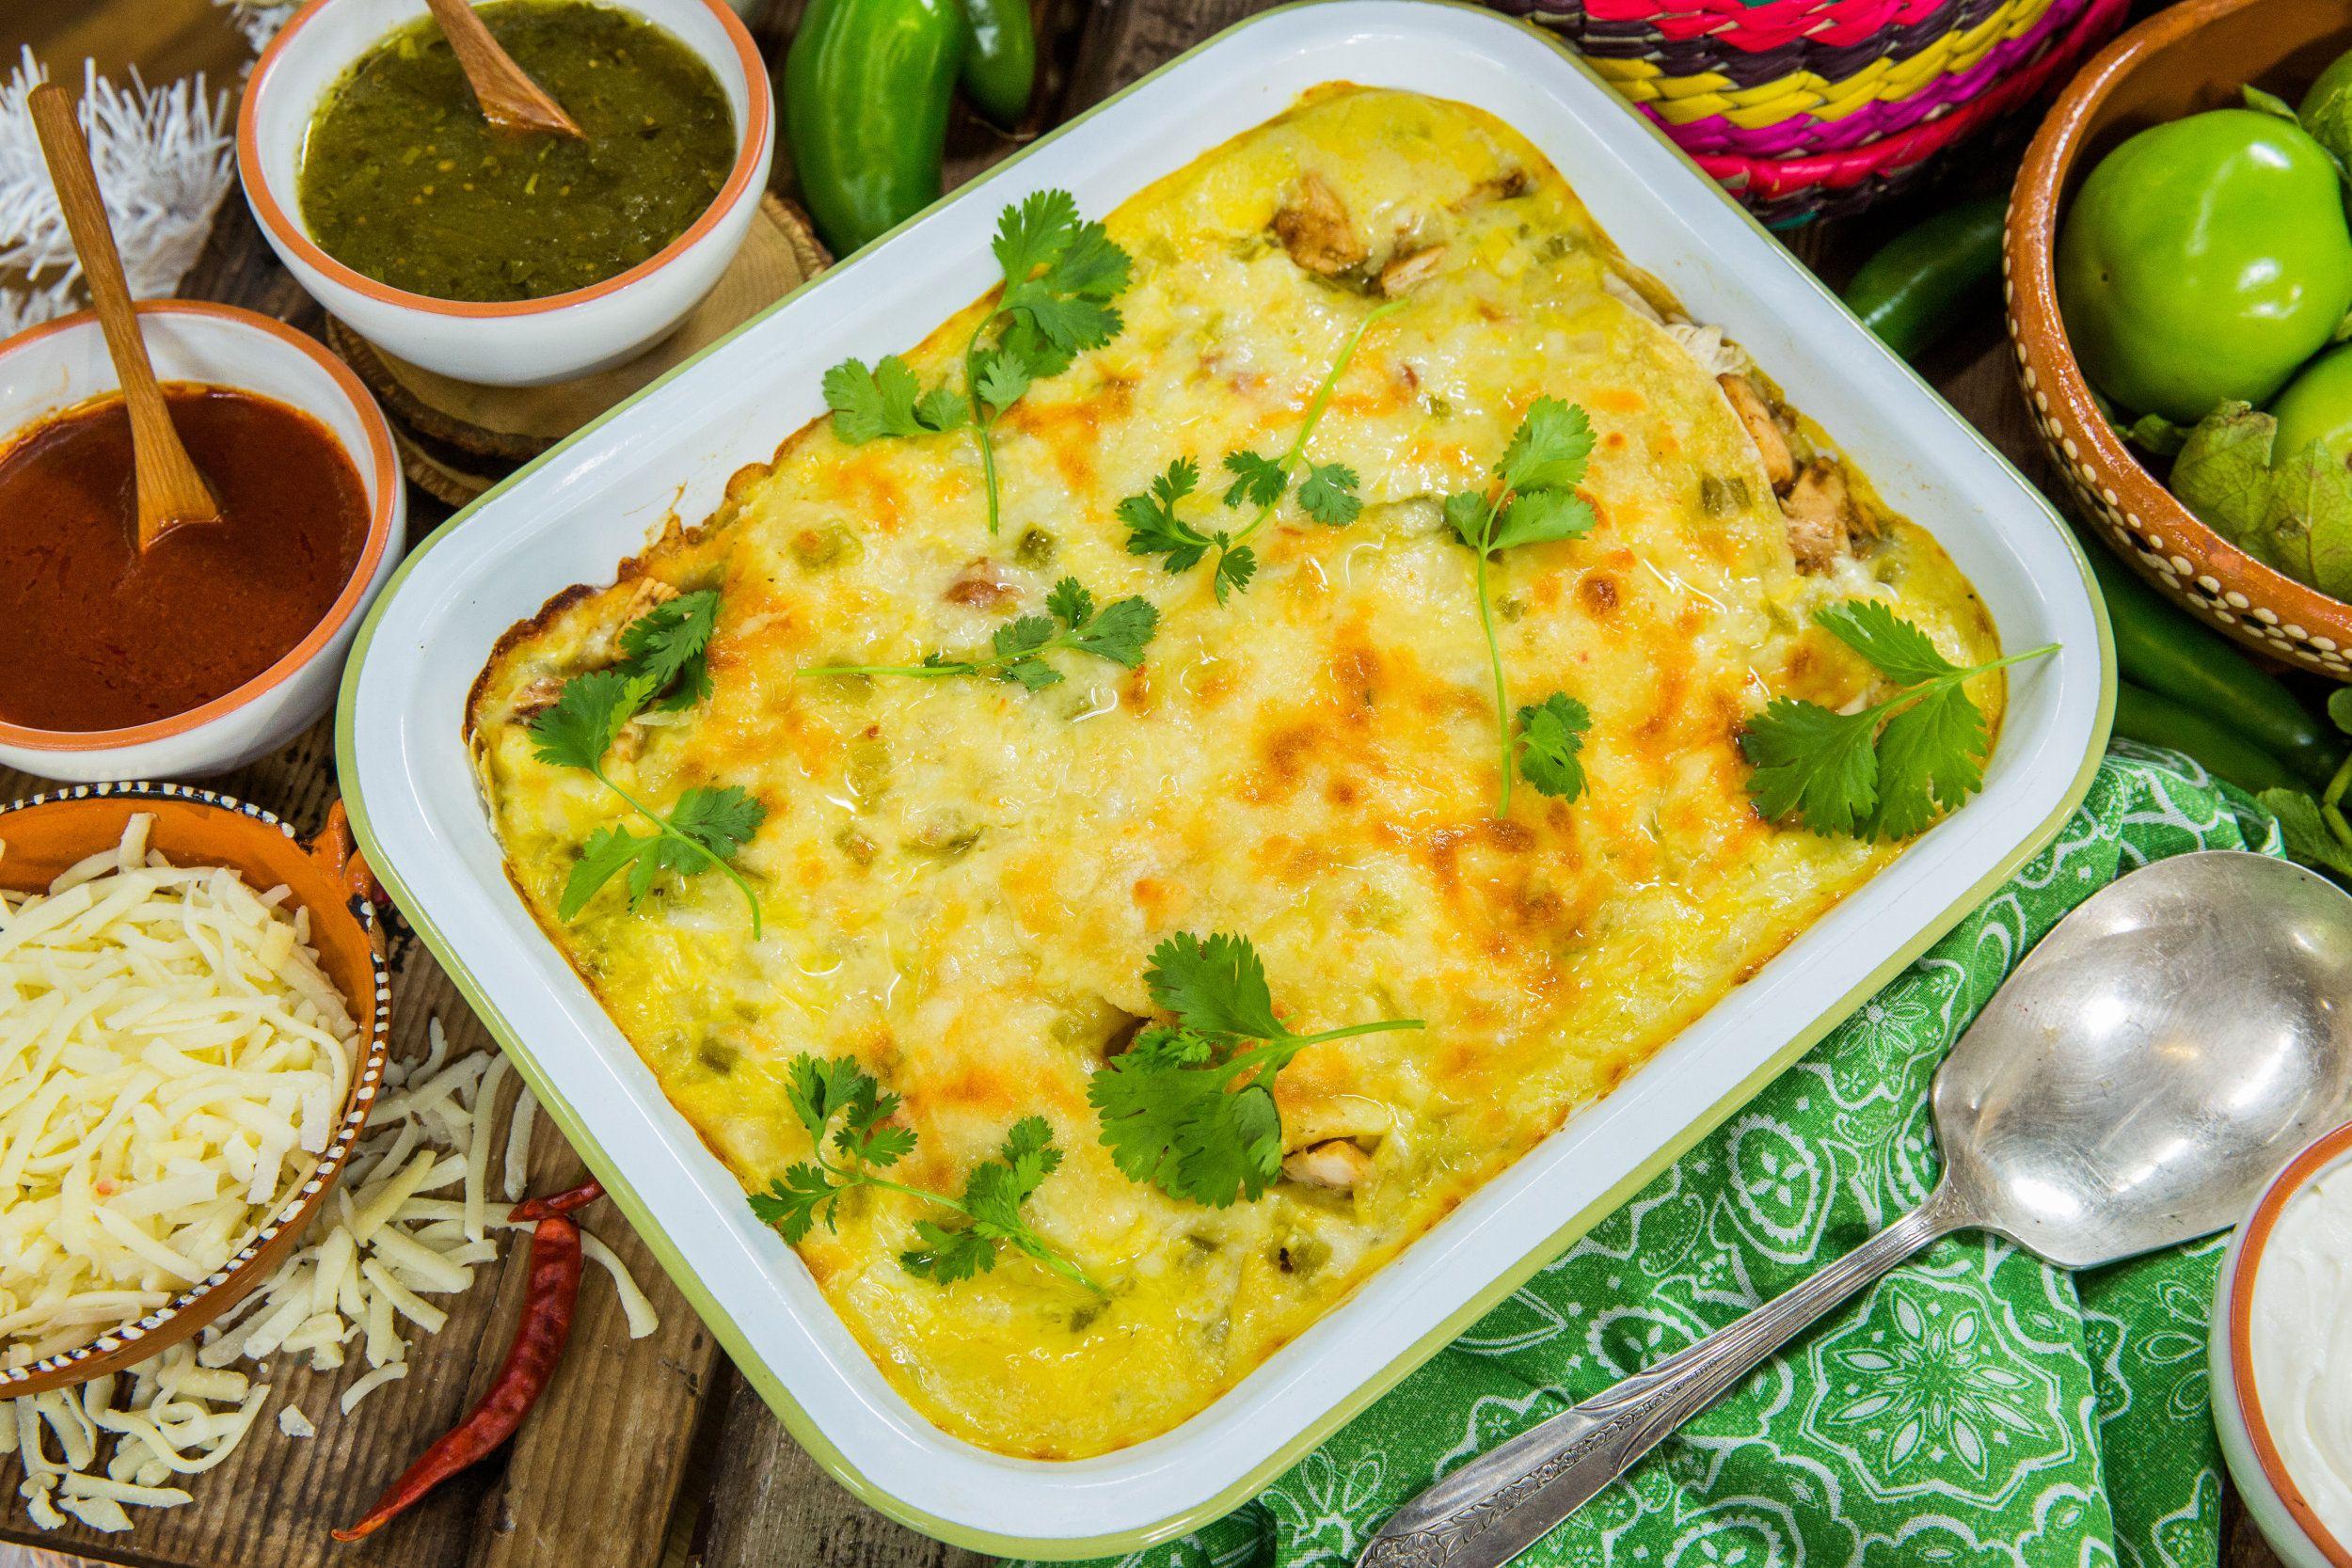 King ranch enchiladas recipe recipes season 4 pinterest want a classic enchilada recipe legendary recording artist larry gatlin wife janis gatlin forumfinder Images